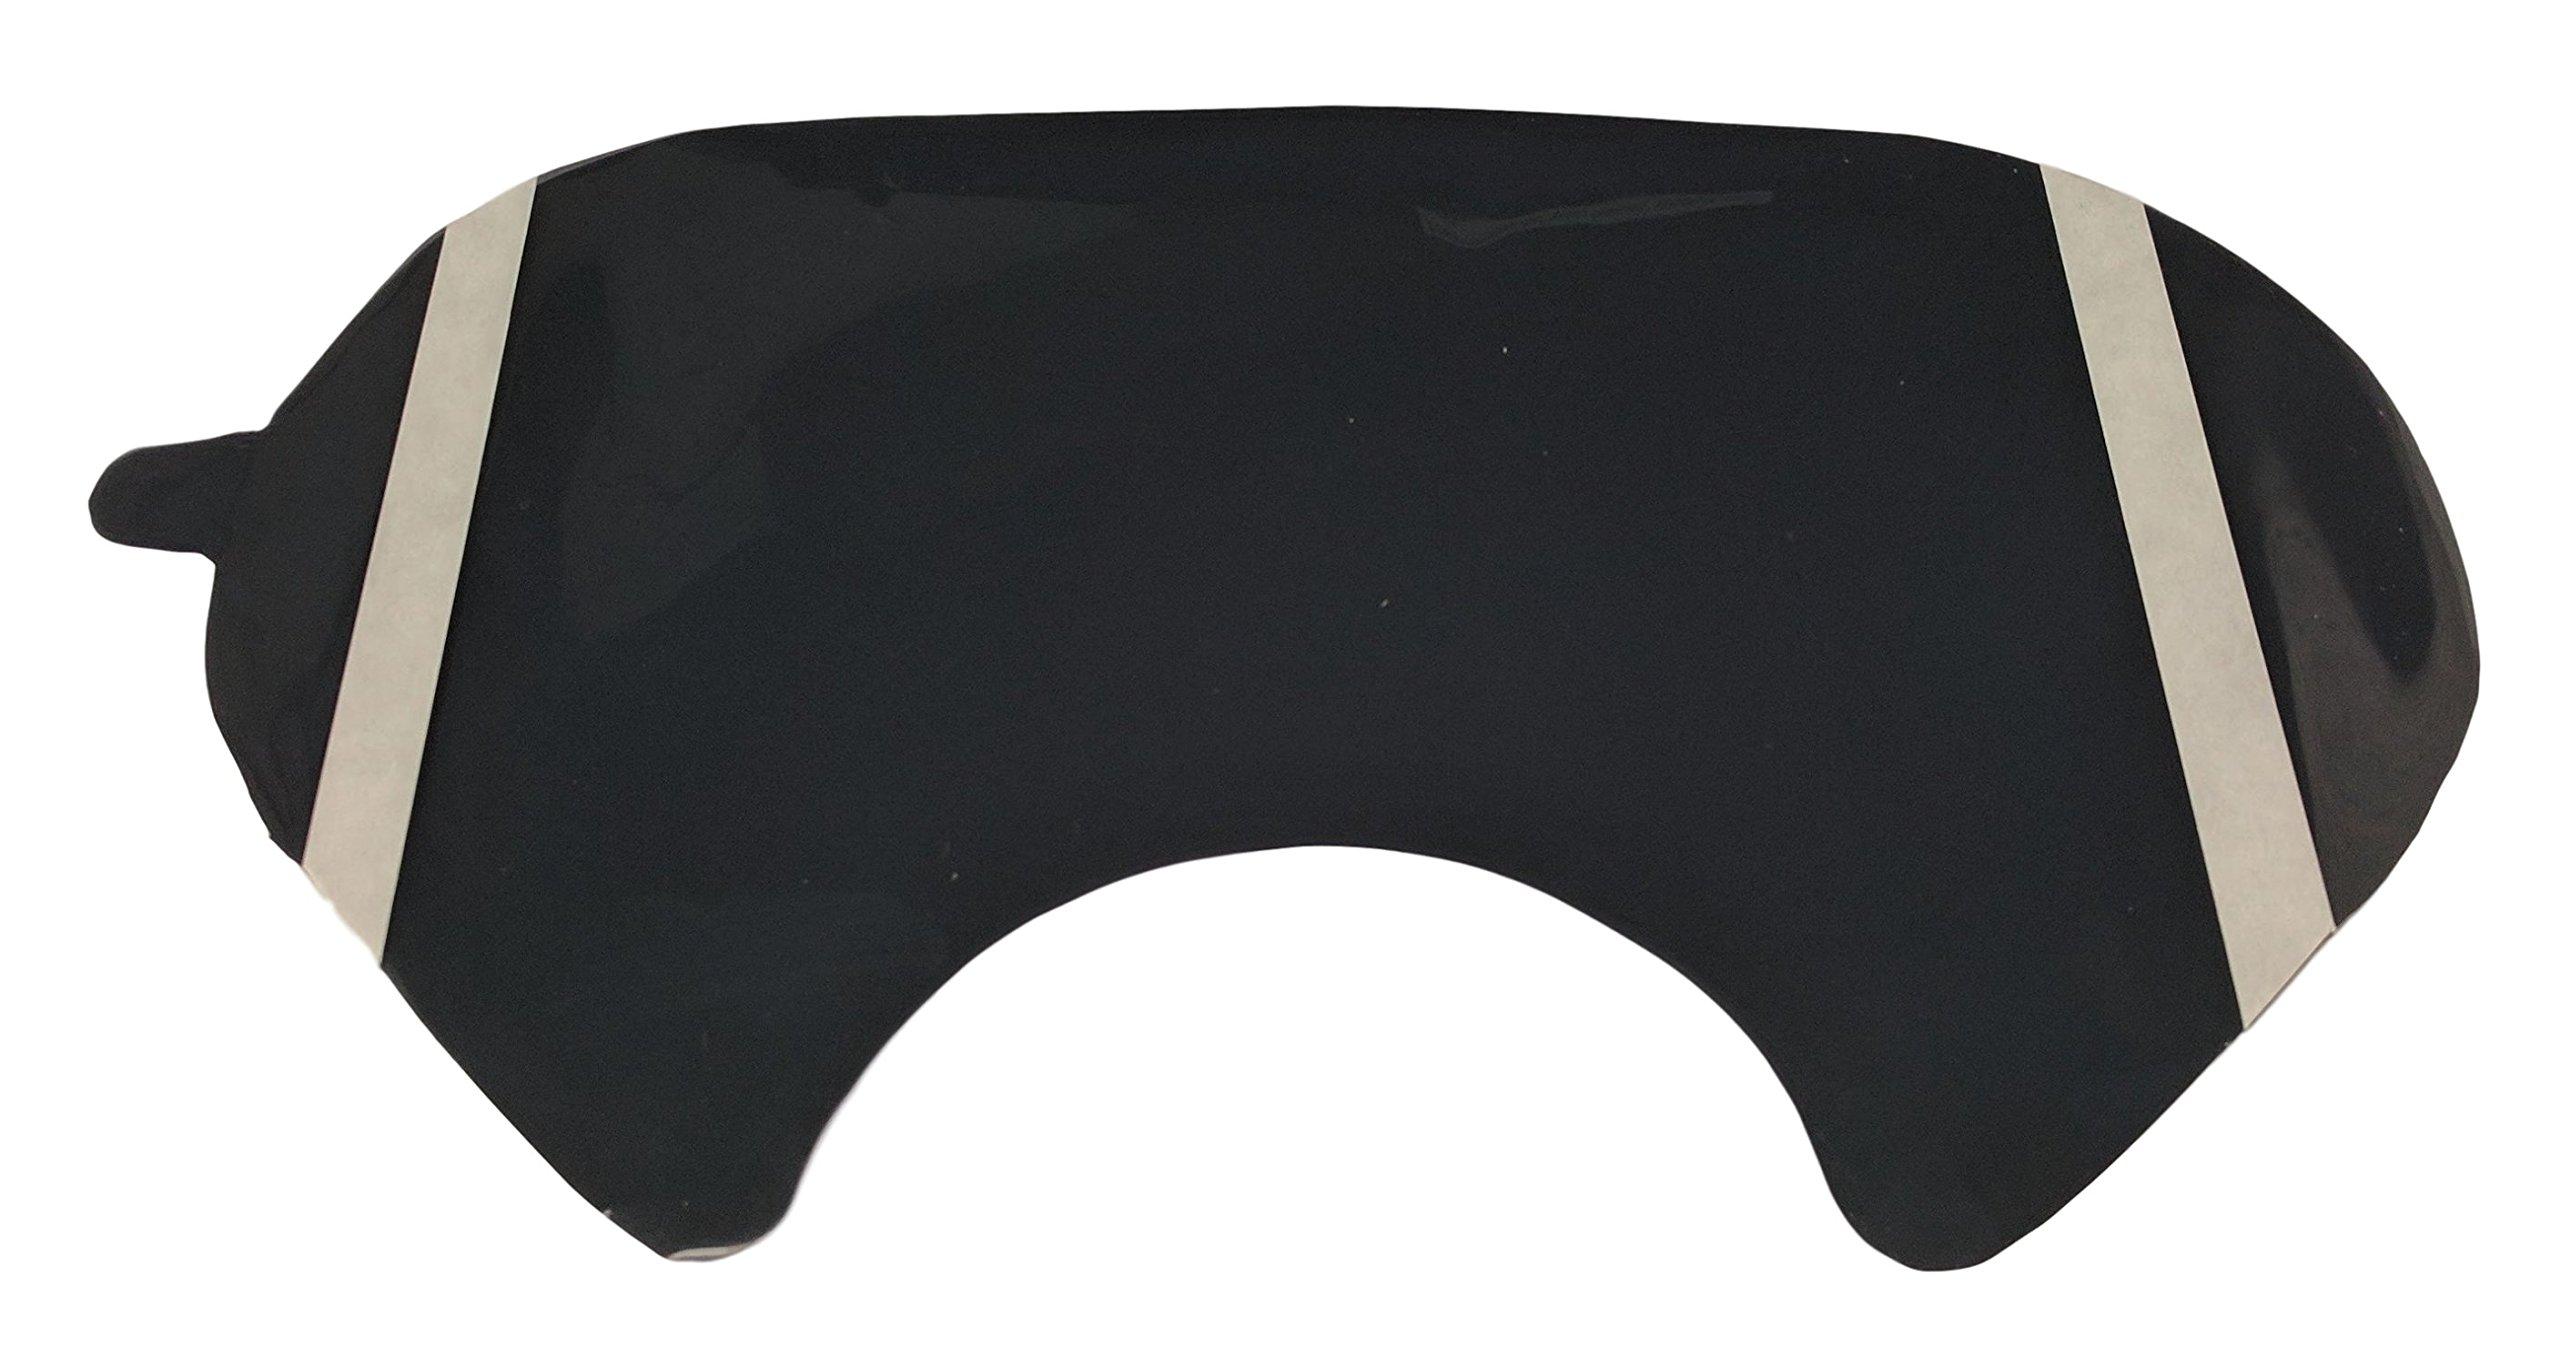 SlagelFoam Tinted Lens Cover 6886, Mask Protector (pack of 5)